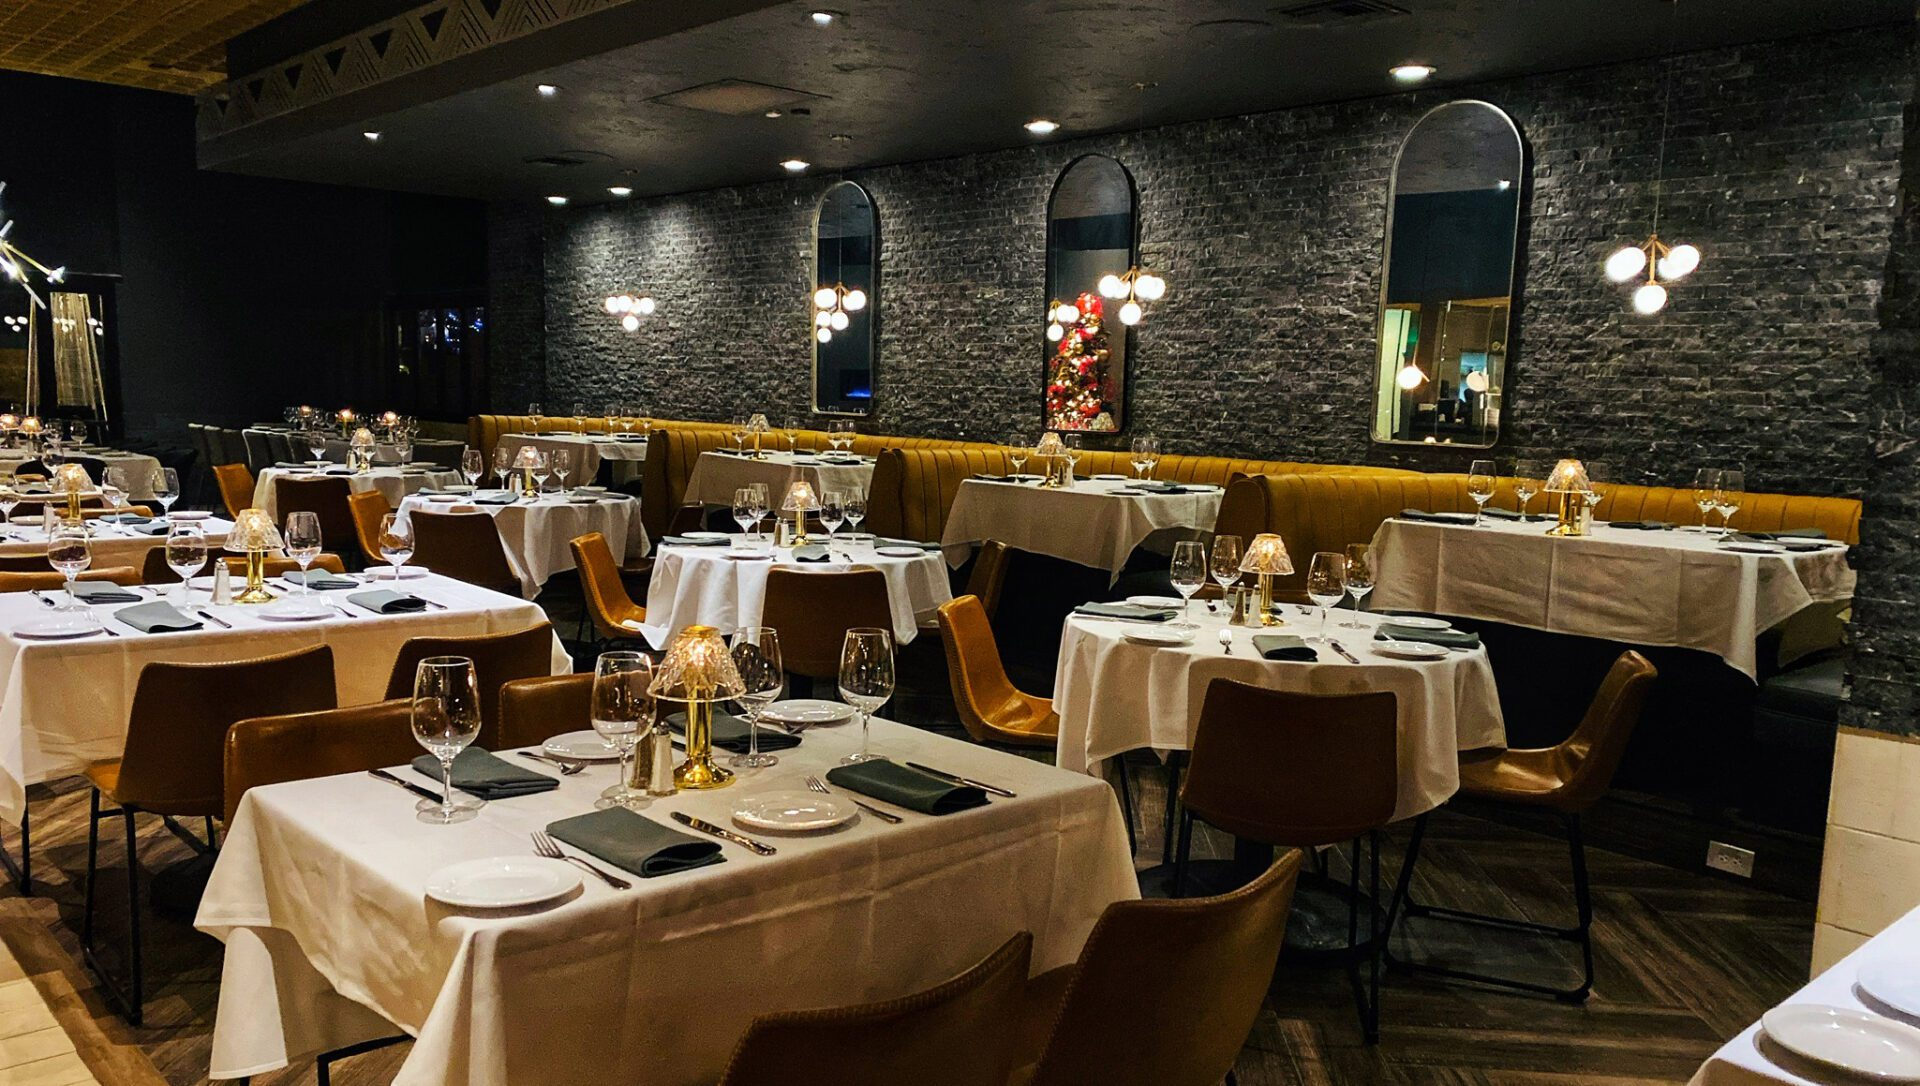 kaiser grille main dining room